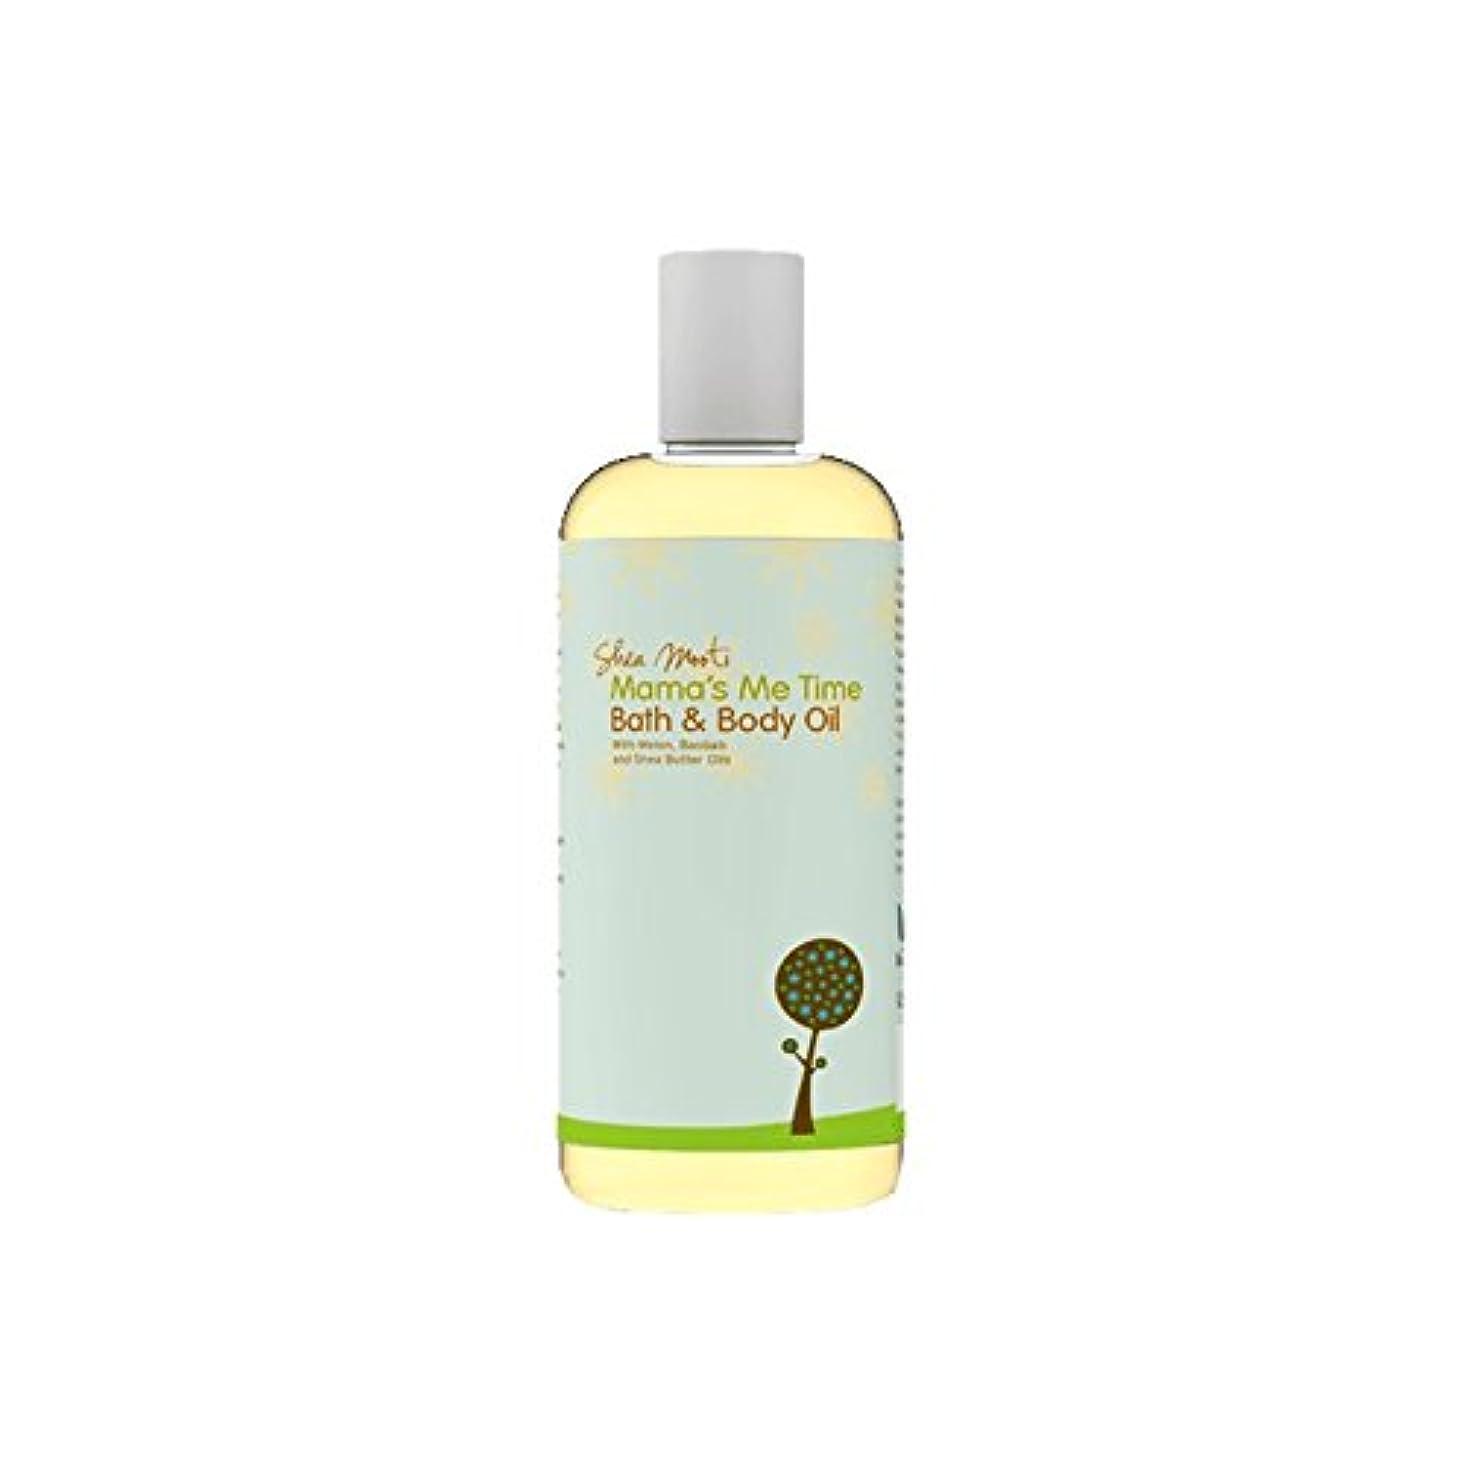 Shea Mooti Mama's Me Time Bath and Body Oil 110g (Pack of 2) - シアバターMootiママの私の時間のバス、ボディオイル110グラム (x2) [並行輸入品]